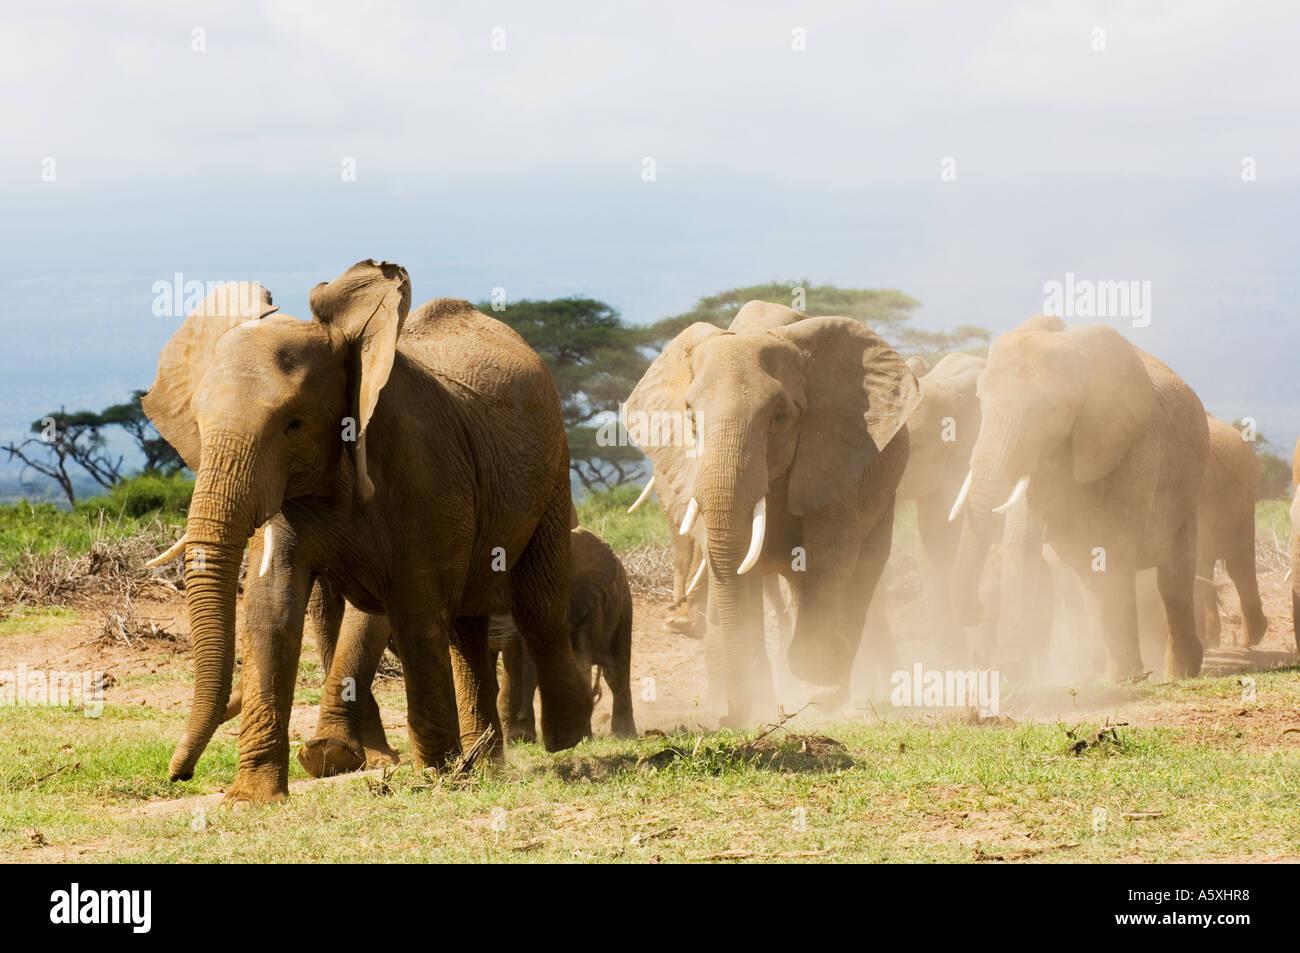 Elephant Herd Amboseli National Park Kenya - Stock Image